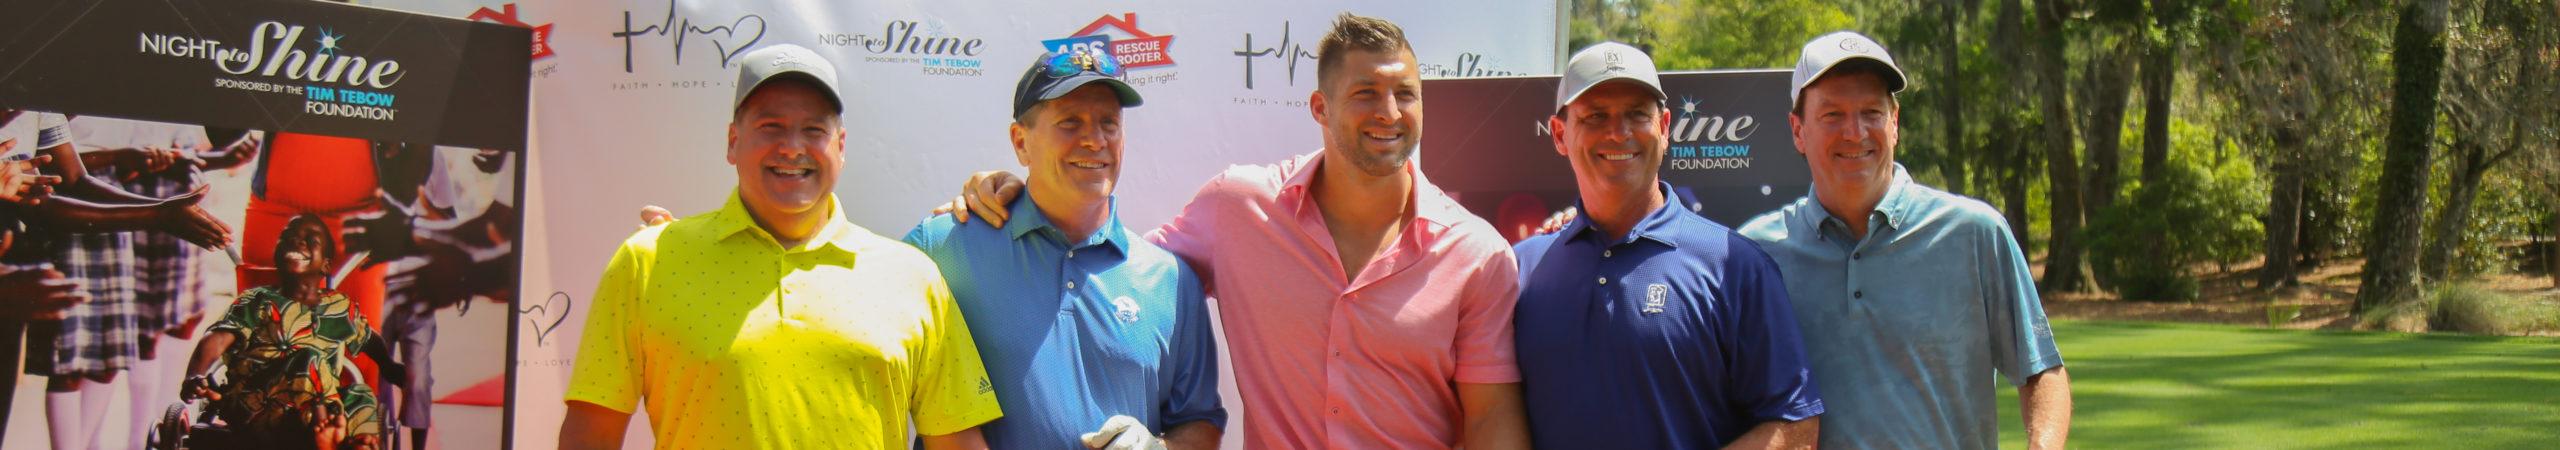 Tim Tebow Foundation Celebrity Golf Classic 2021